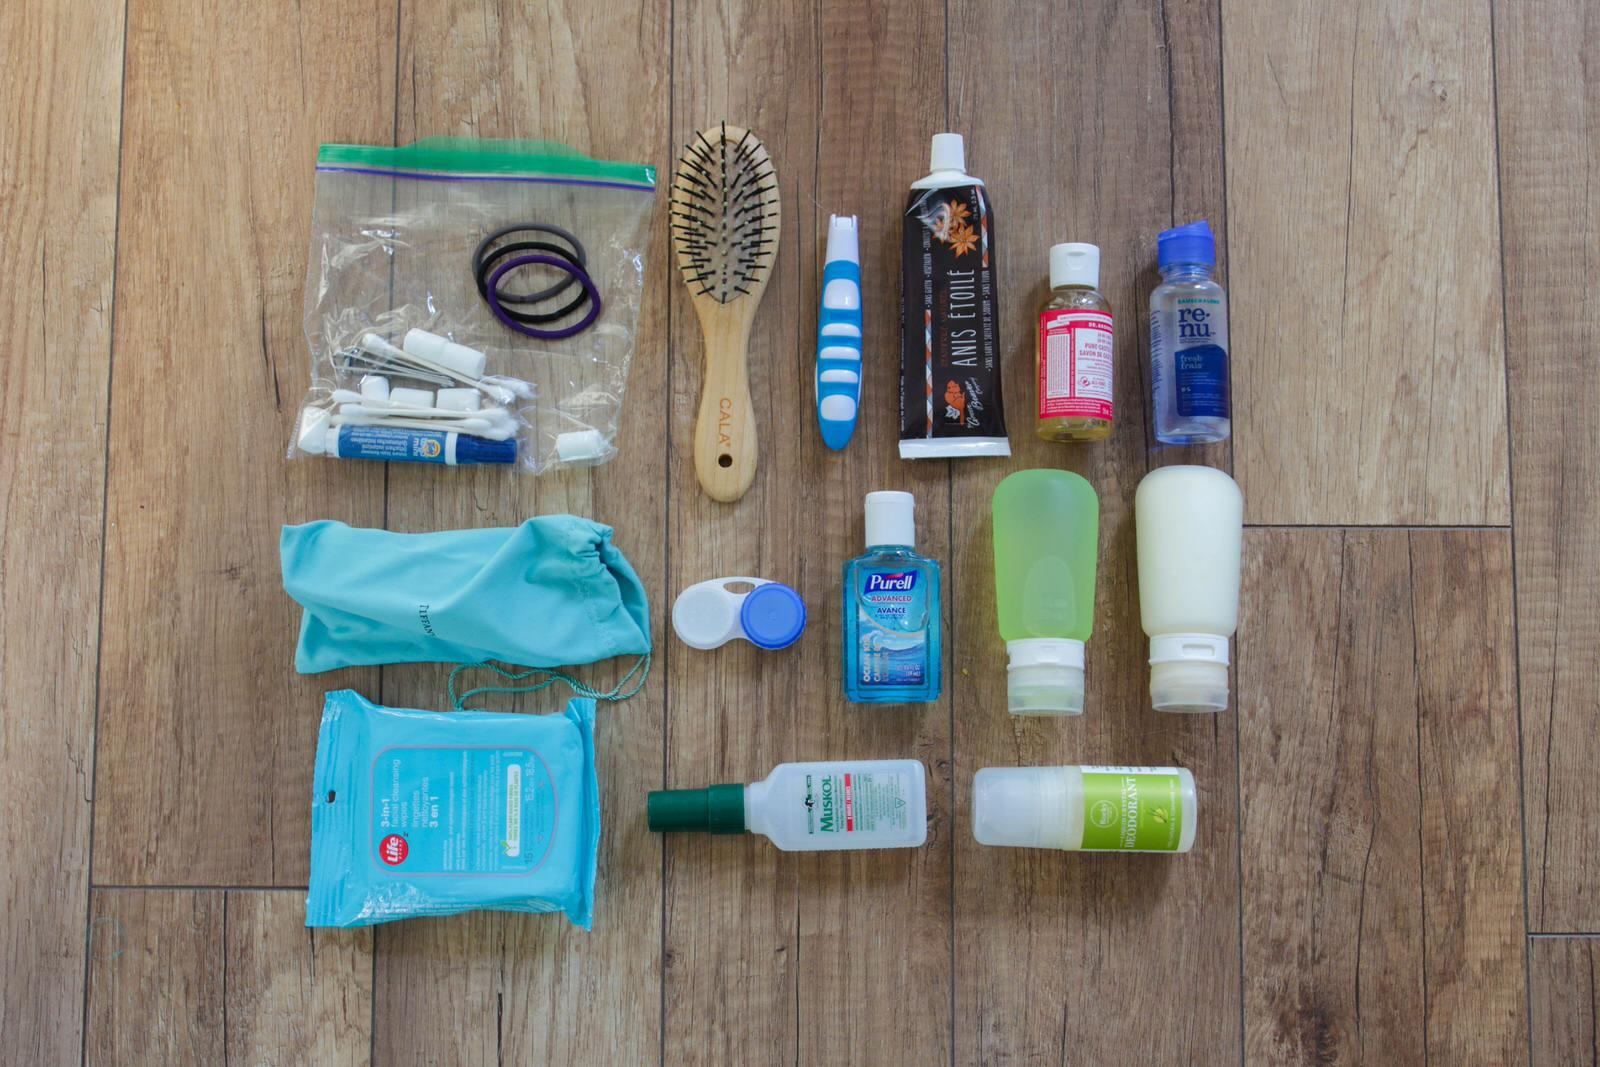 Toiletries. Packing for a ski season - essential checklist for seasonaires.